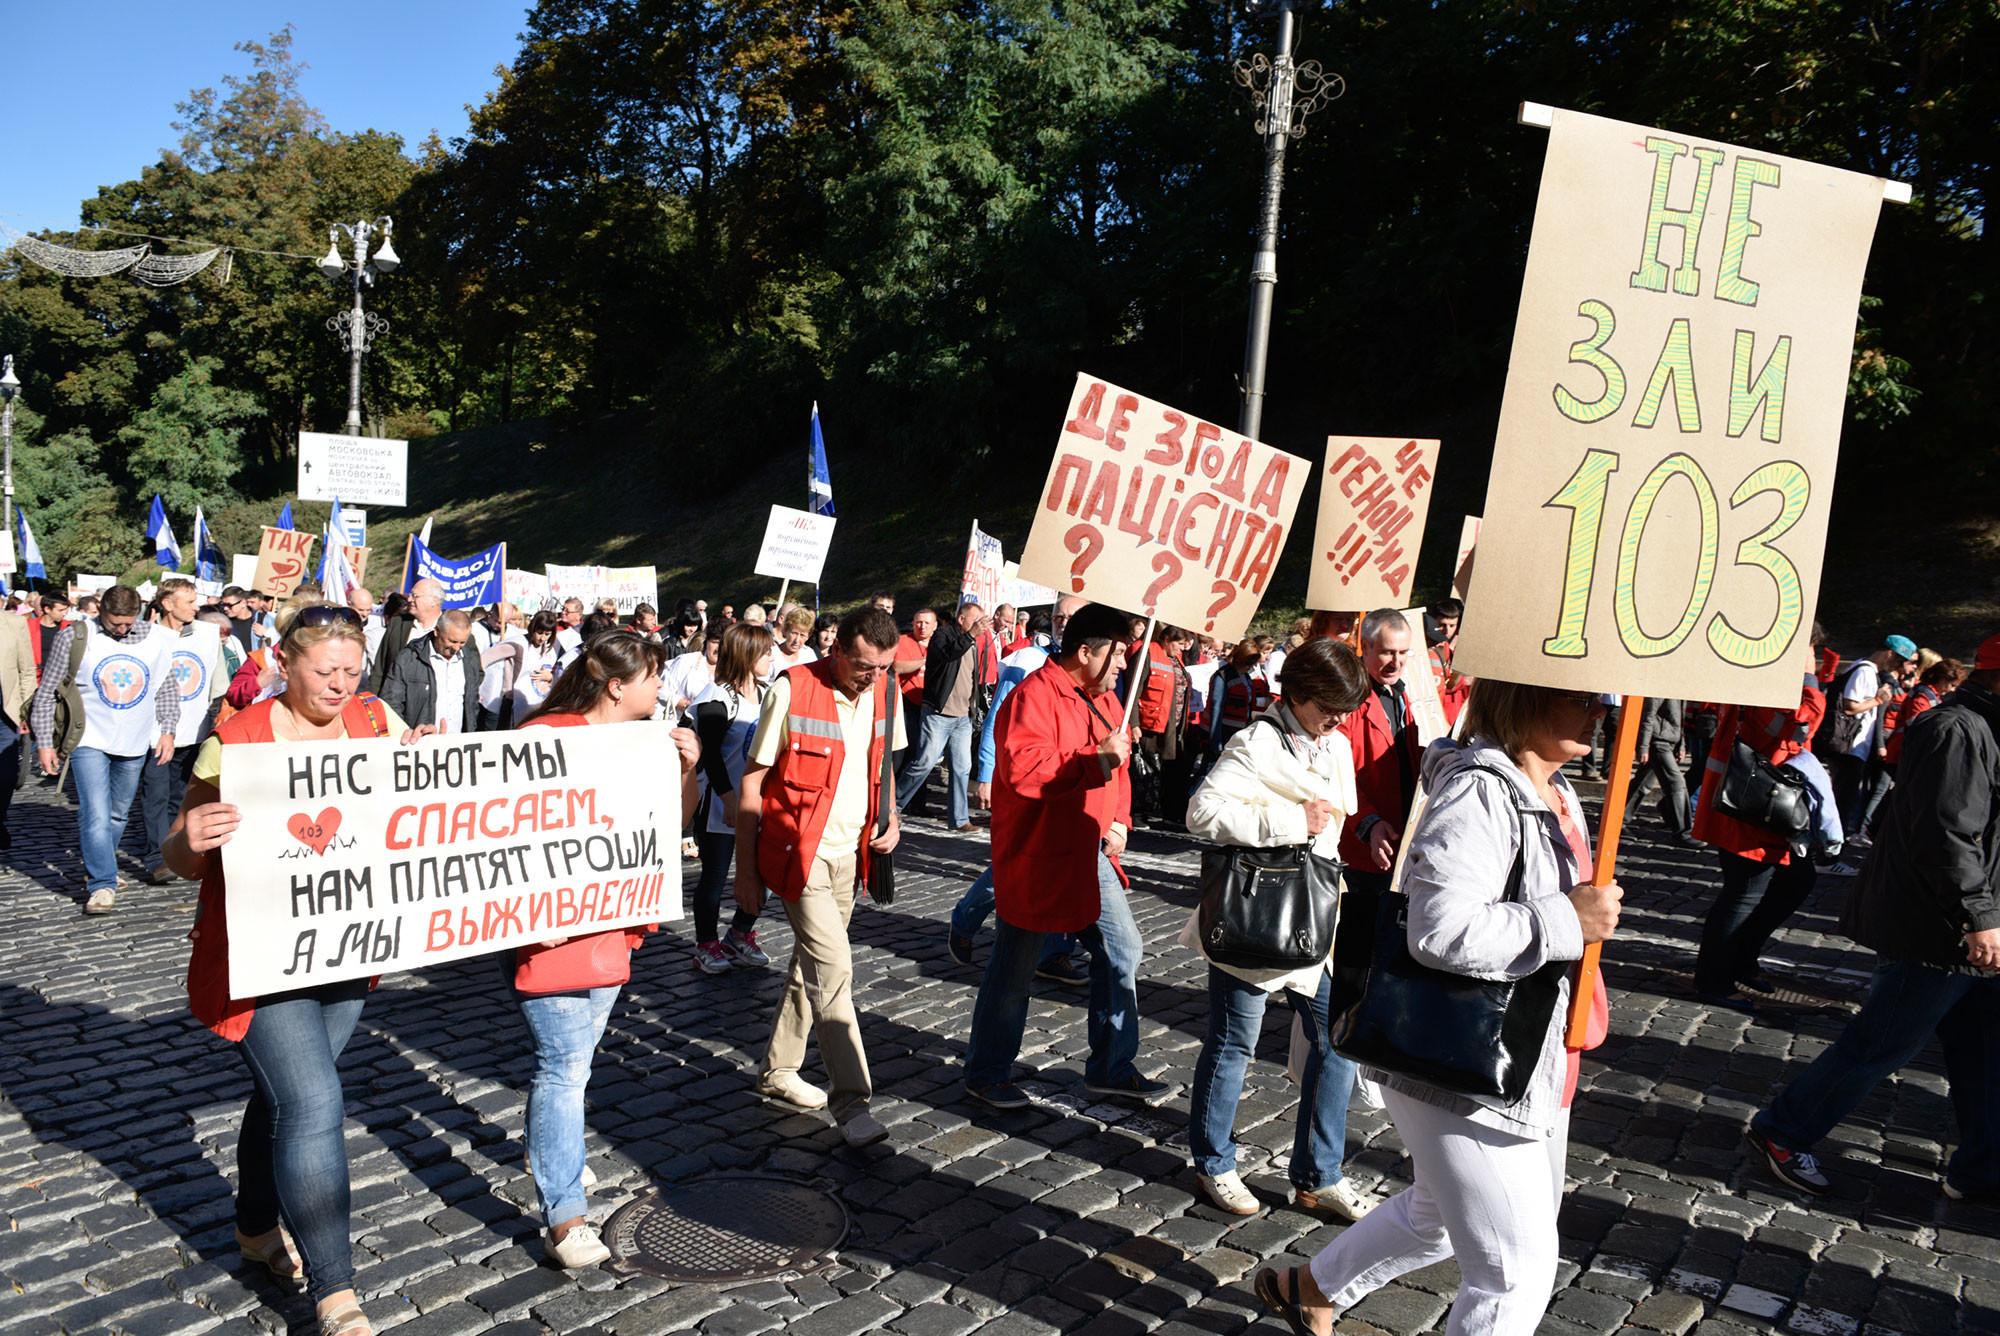 Участники акции протеста работников здравоохранения в Киеве. Фото: © РИА Новости / Стрингер